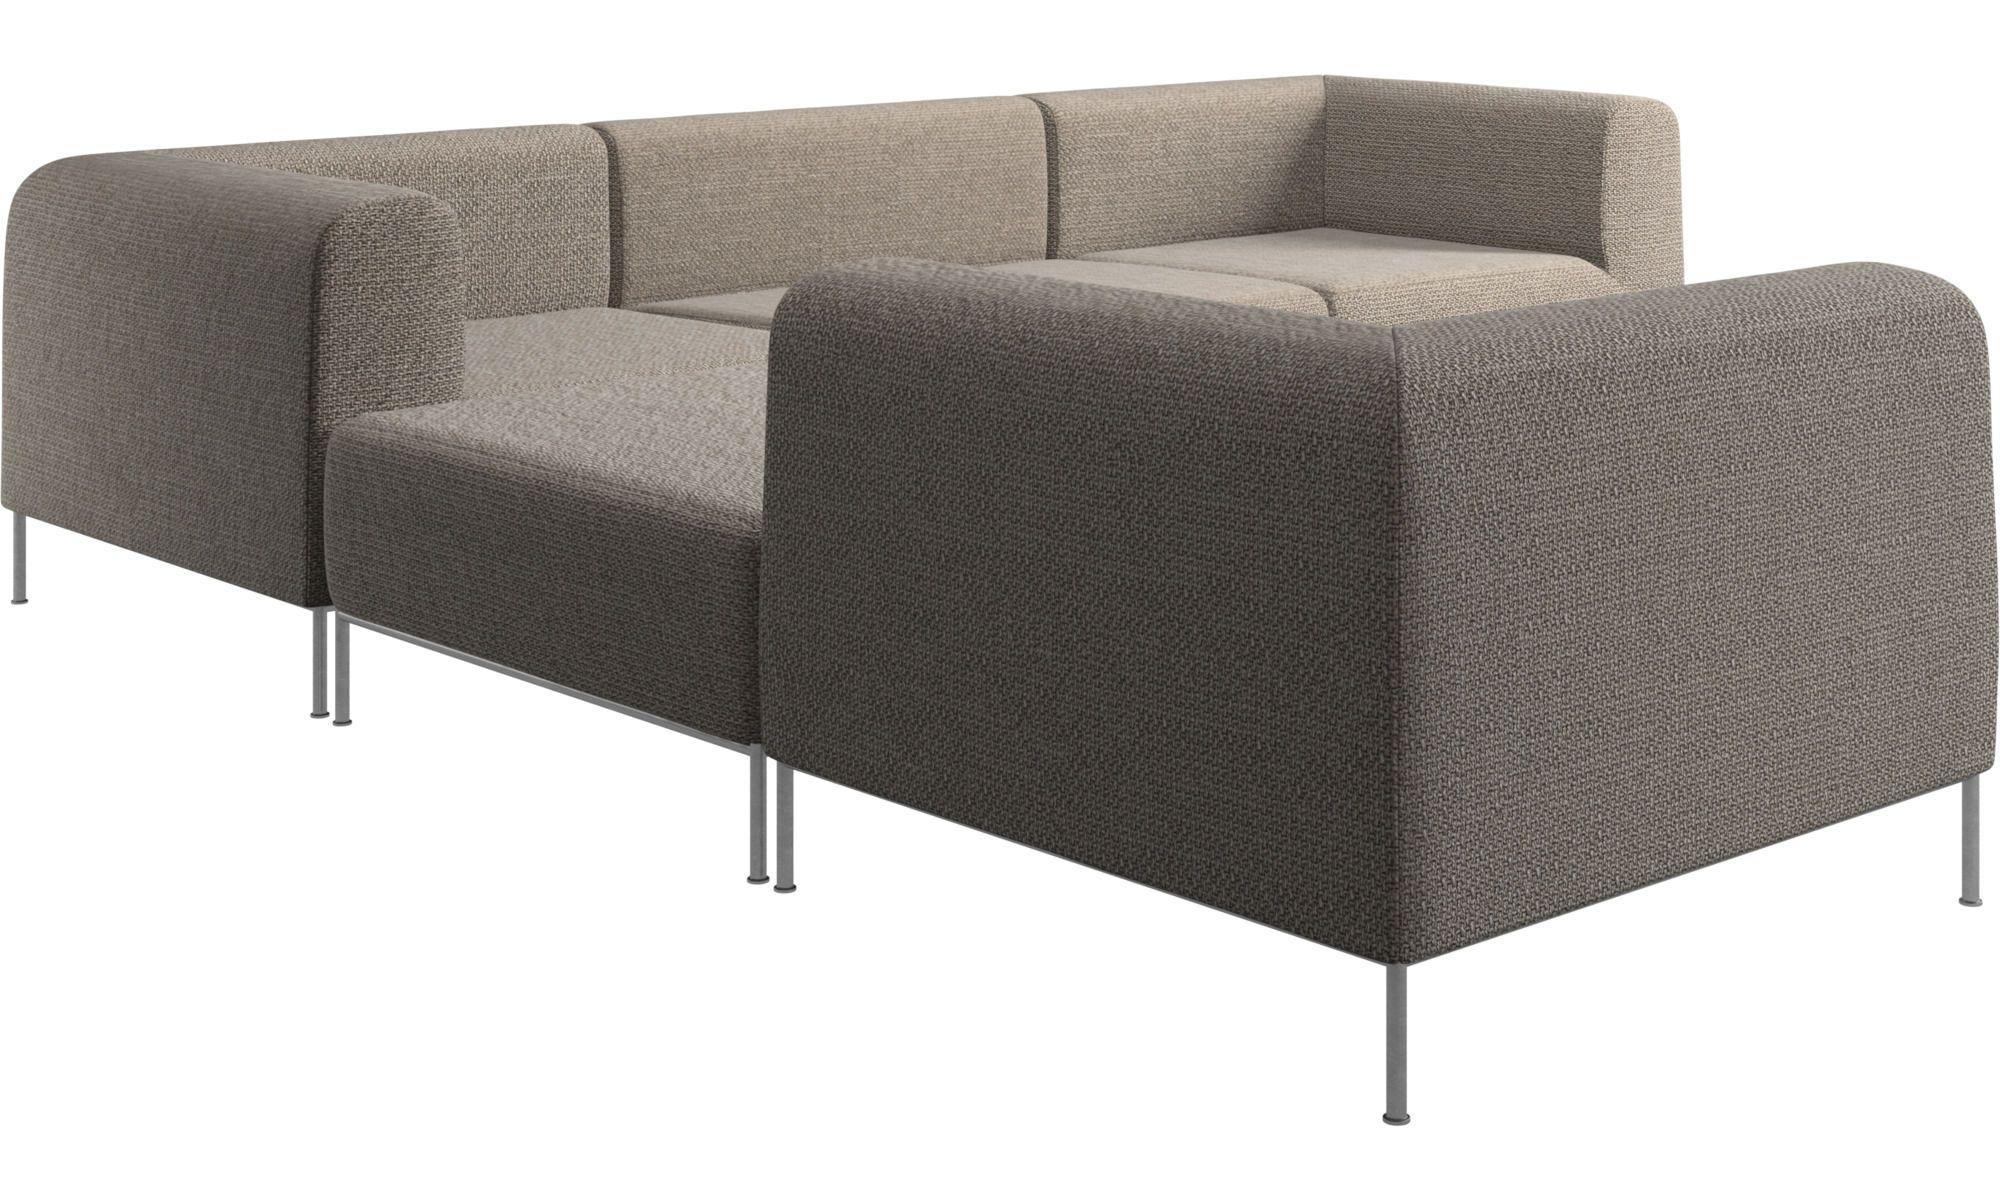 Modular Sofas Miami Corner Sofa With Footstool On Left Side Brown Fabric